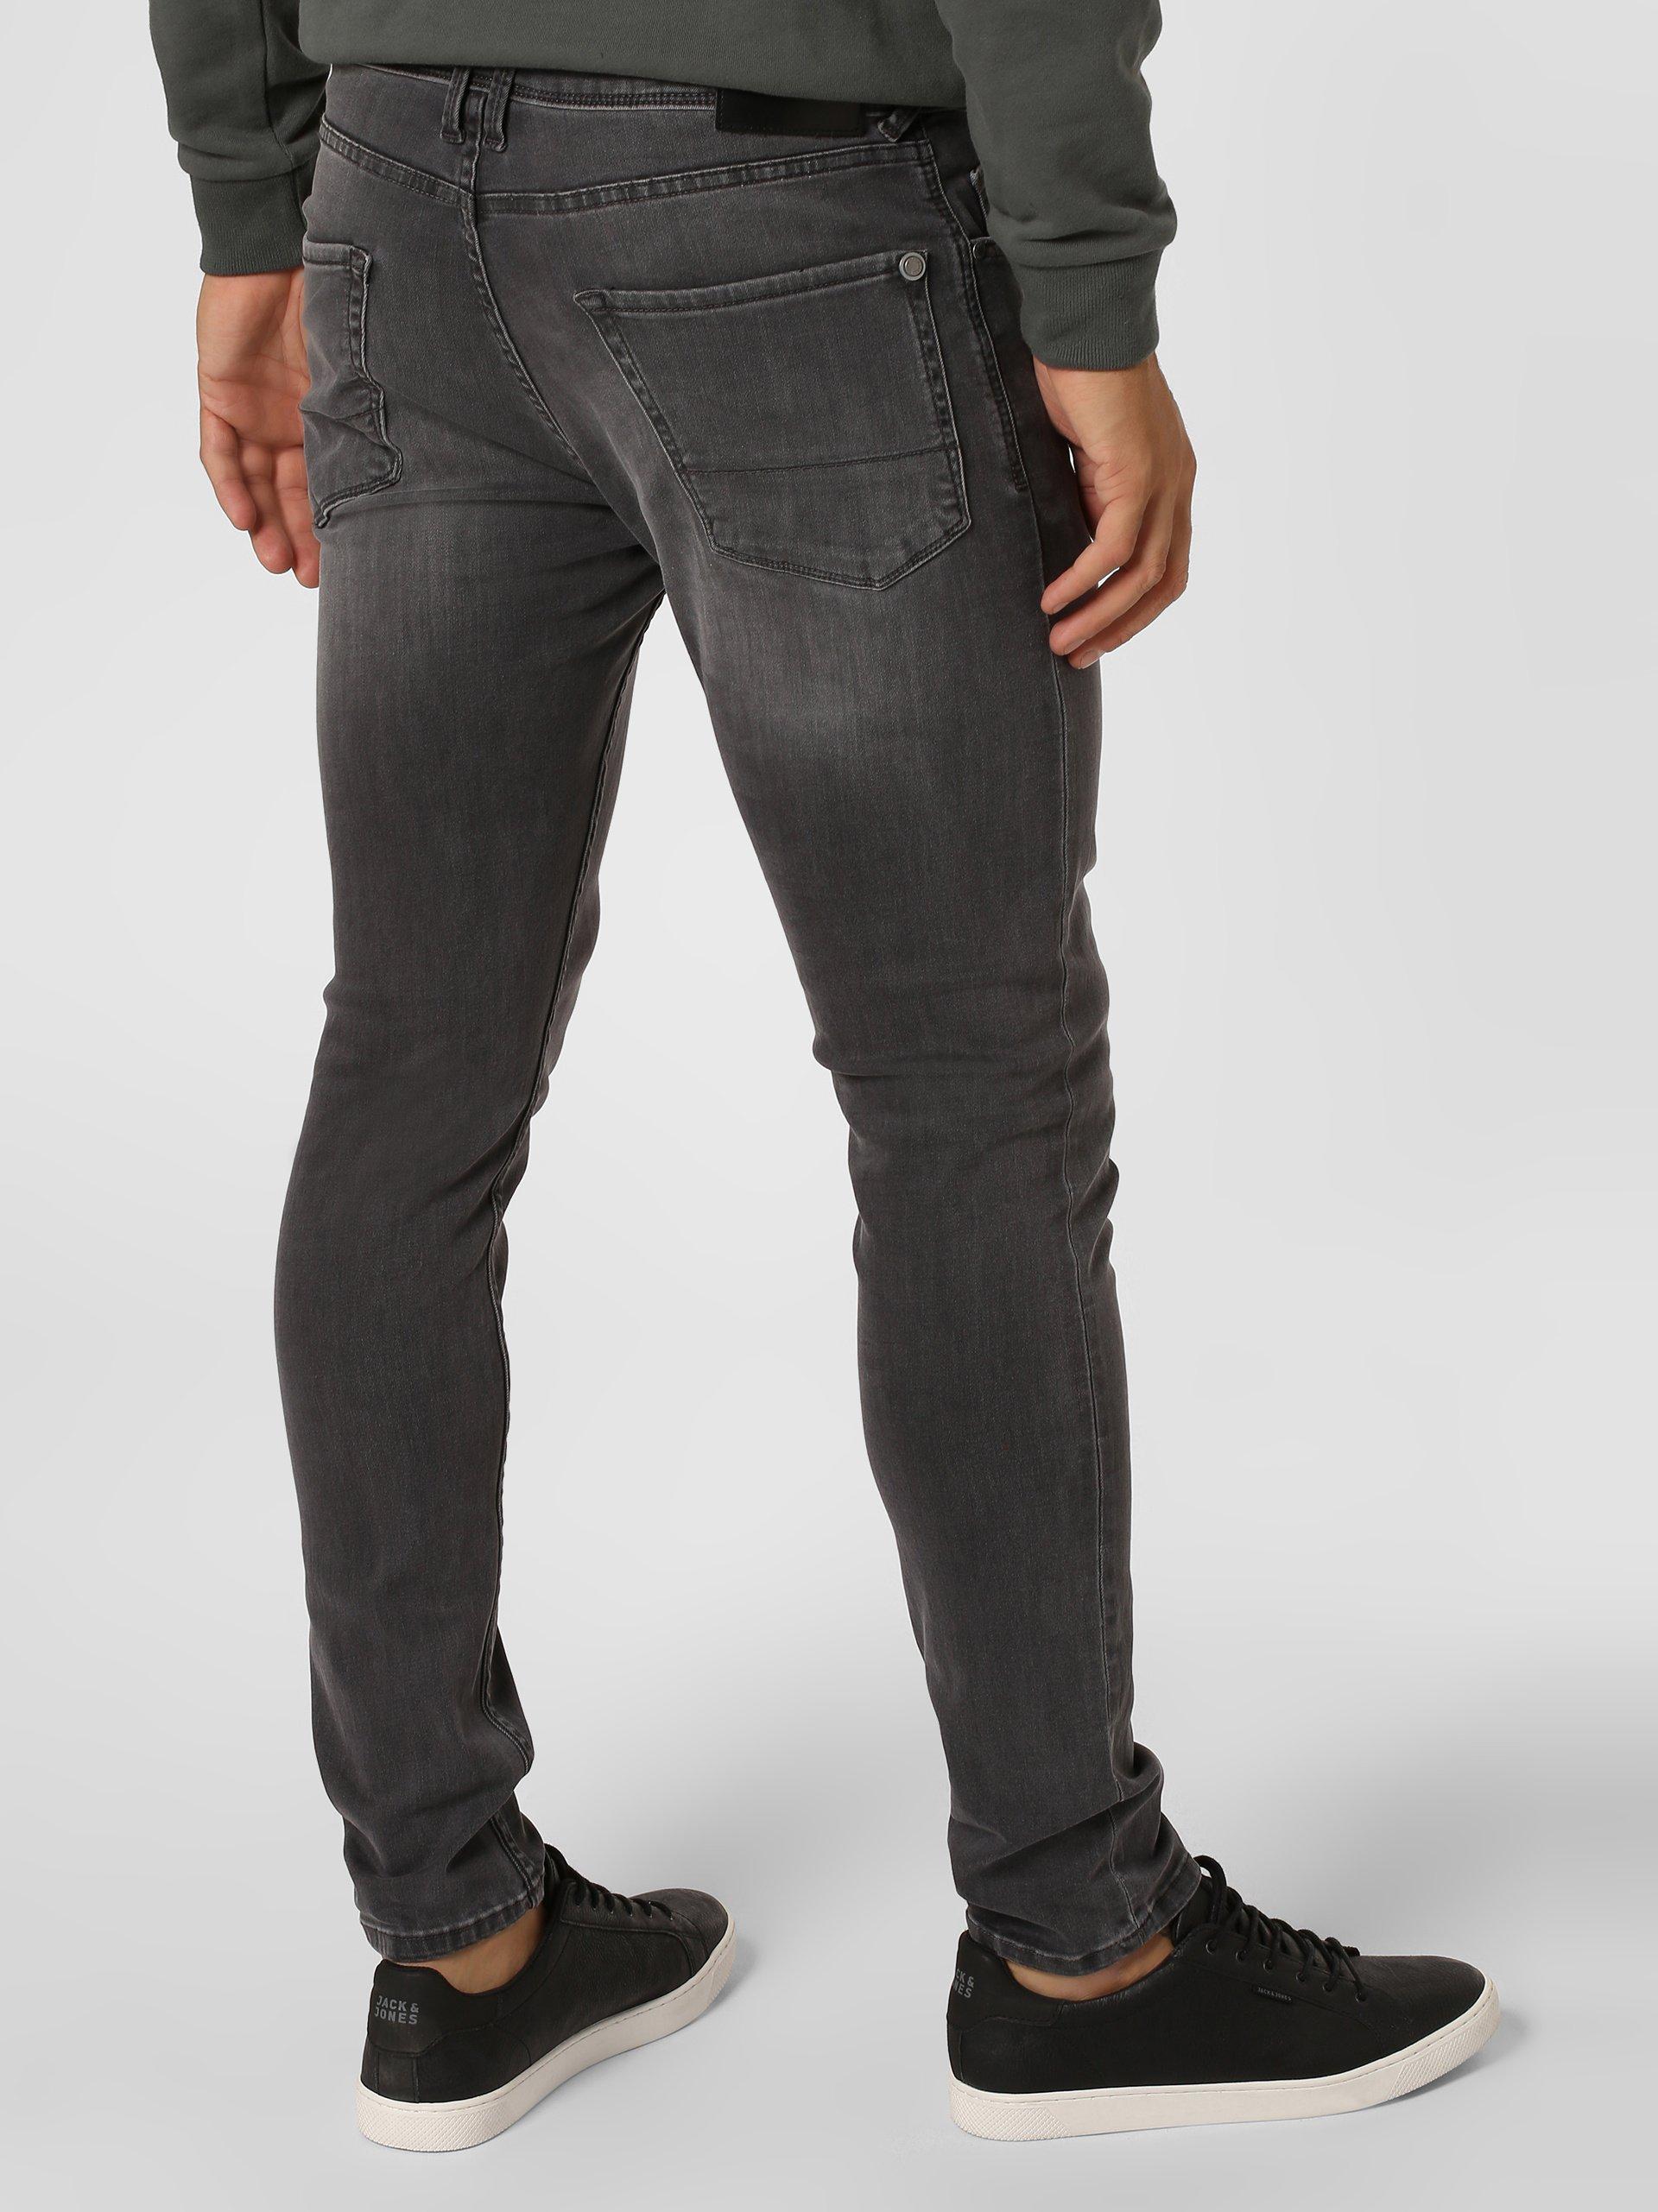 pepe jeans herren jeans finsbury online kaufen. Black Bedroom Furniture Sets. Home Design Ideas